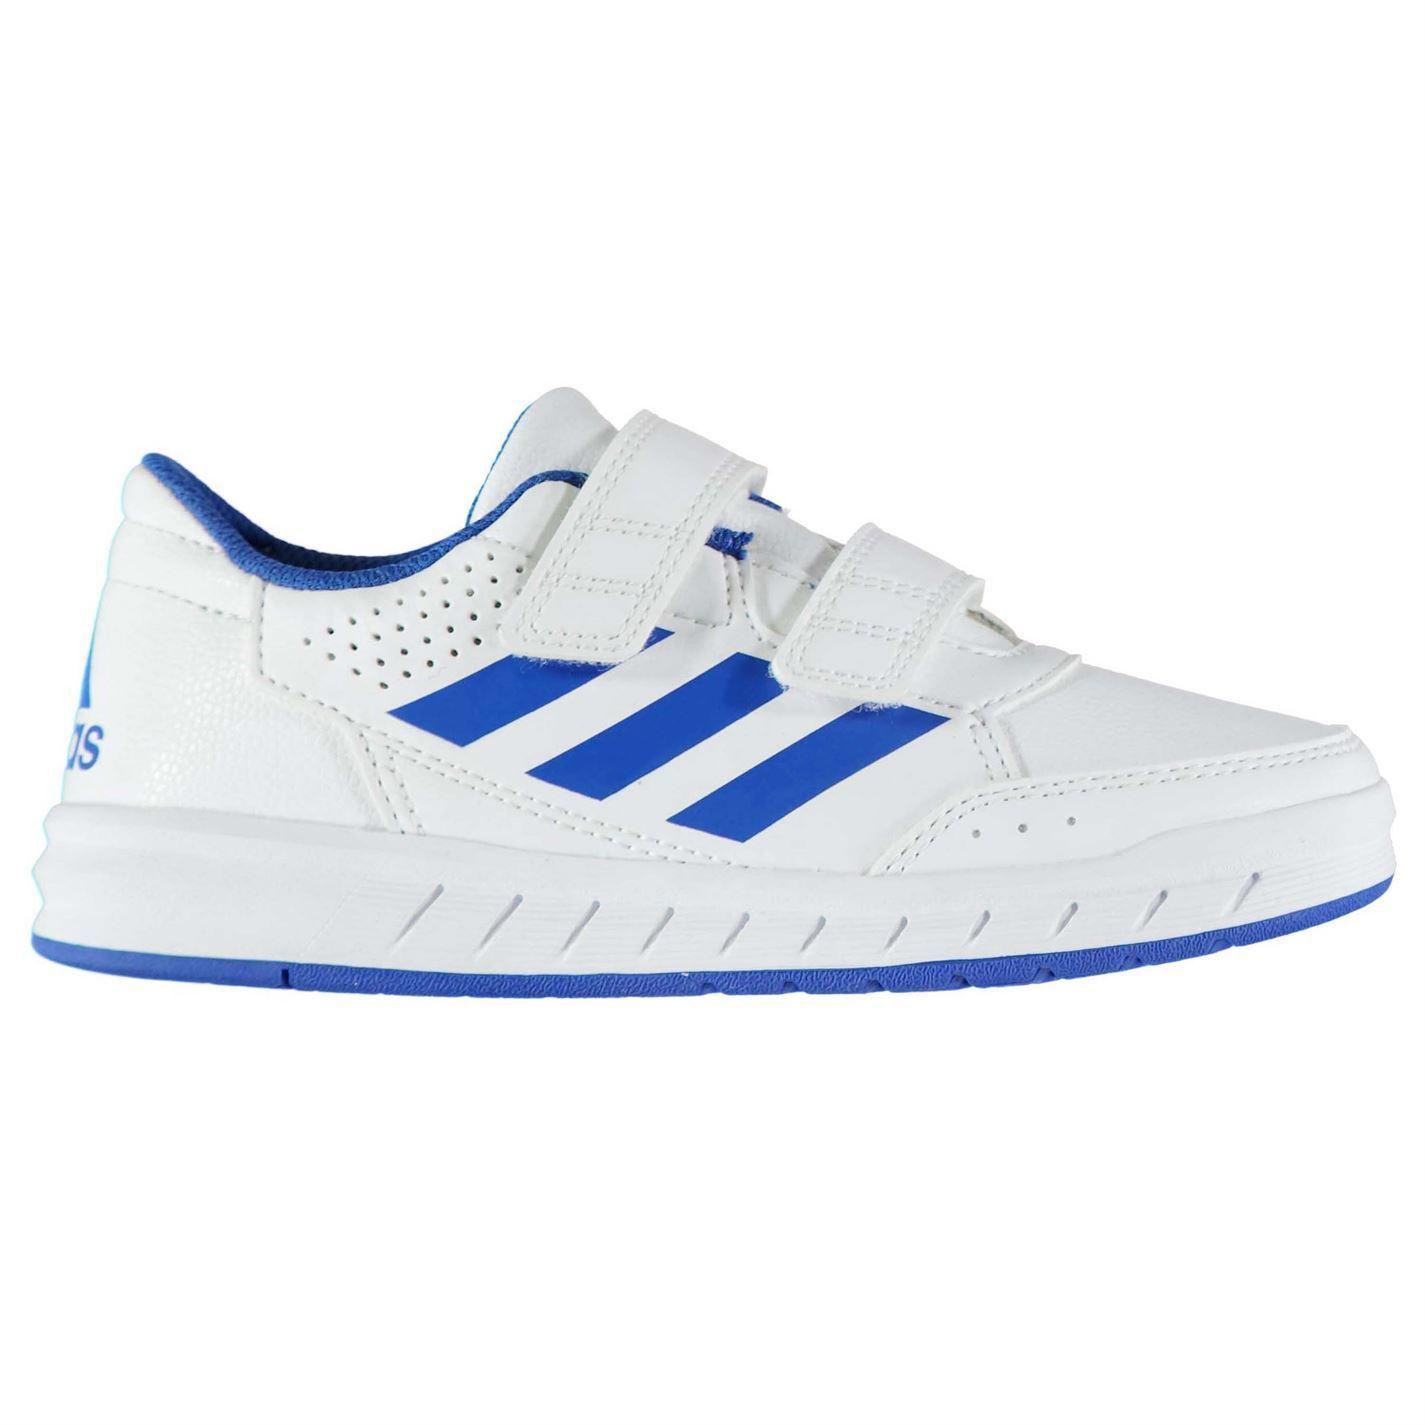 miniatura 15 - ADIDAS-alta-Sport-CF-Scarpe-da-ginnastica-bambino-ragazzo-calzature